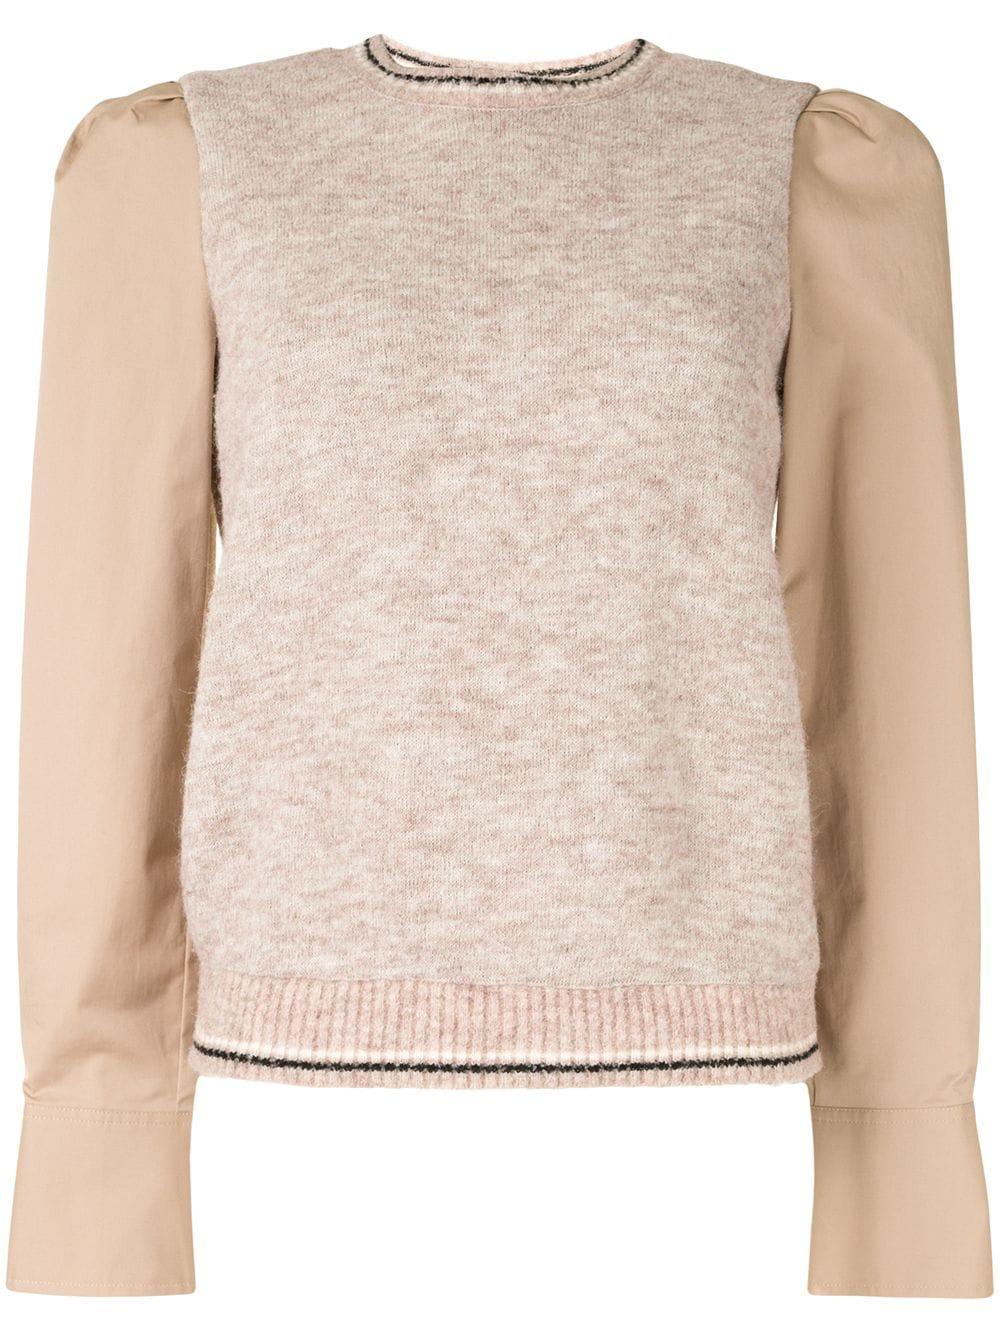 Milton Mixed Media Sweater Item # TF01733CP